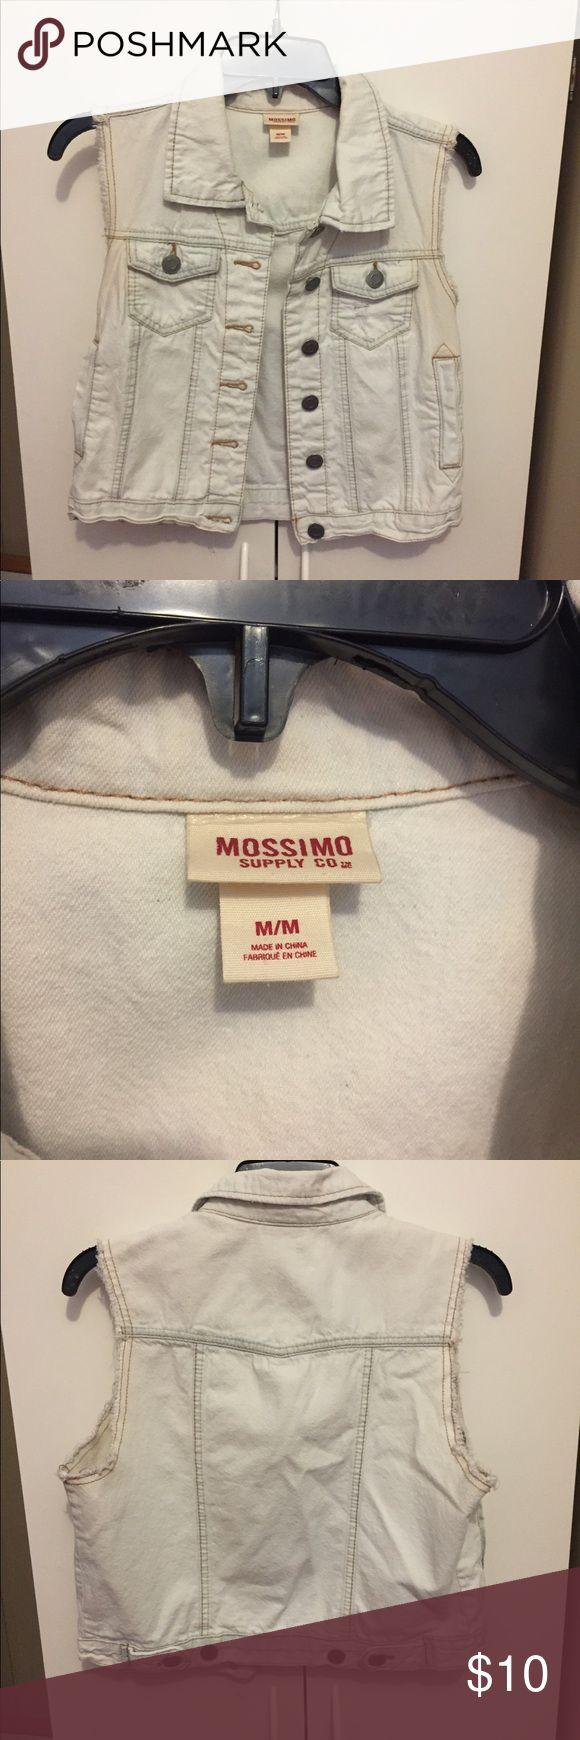 White denim vest Mossimo white denim vest, in perfect condition Mossimo Supply Co Jackets & Coats Vests